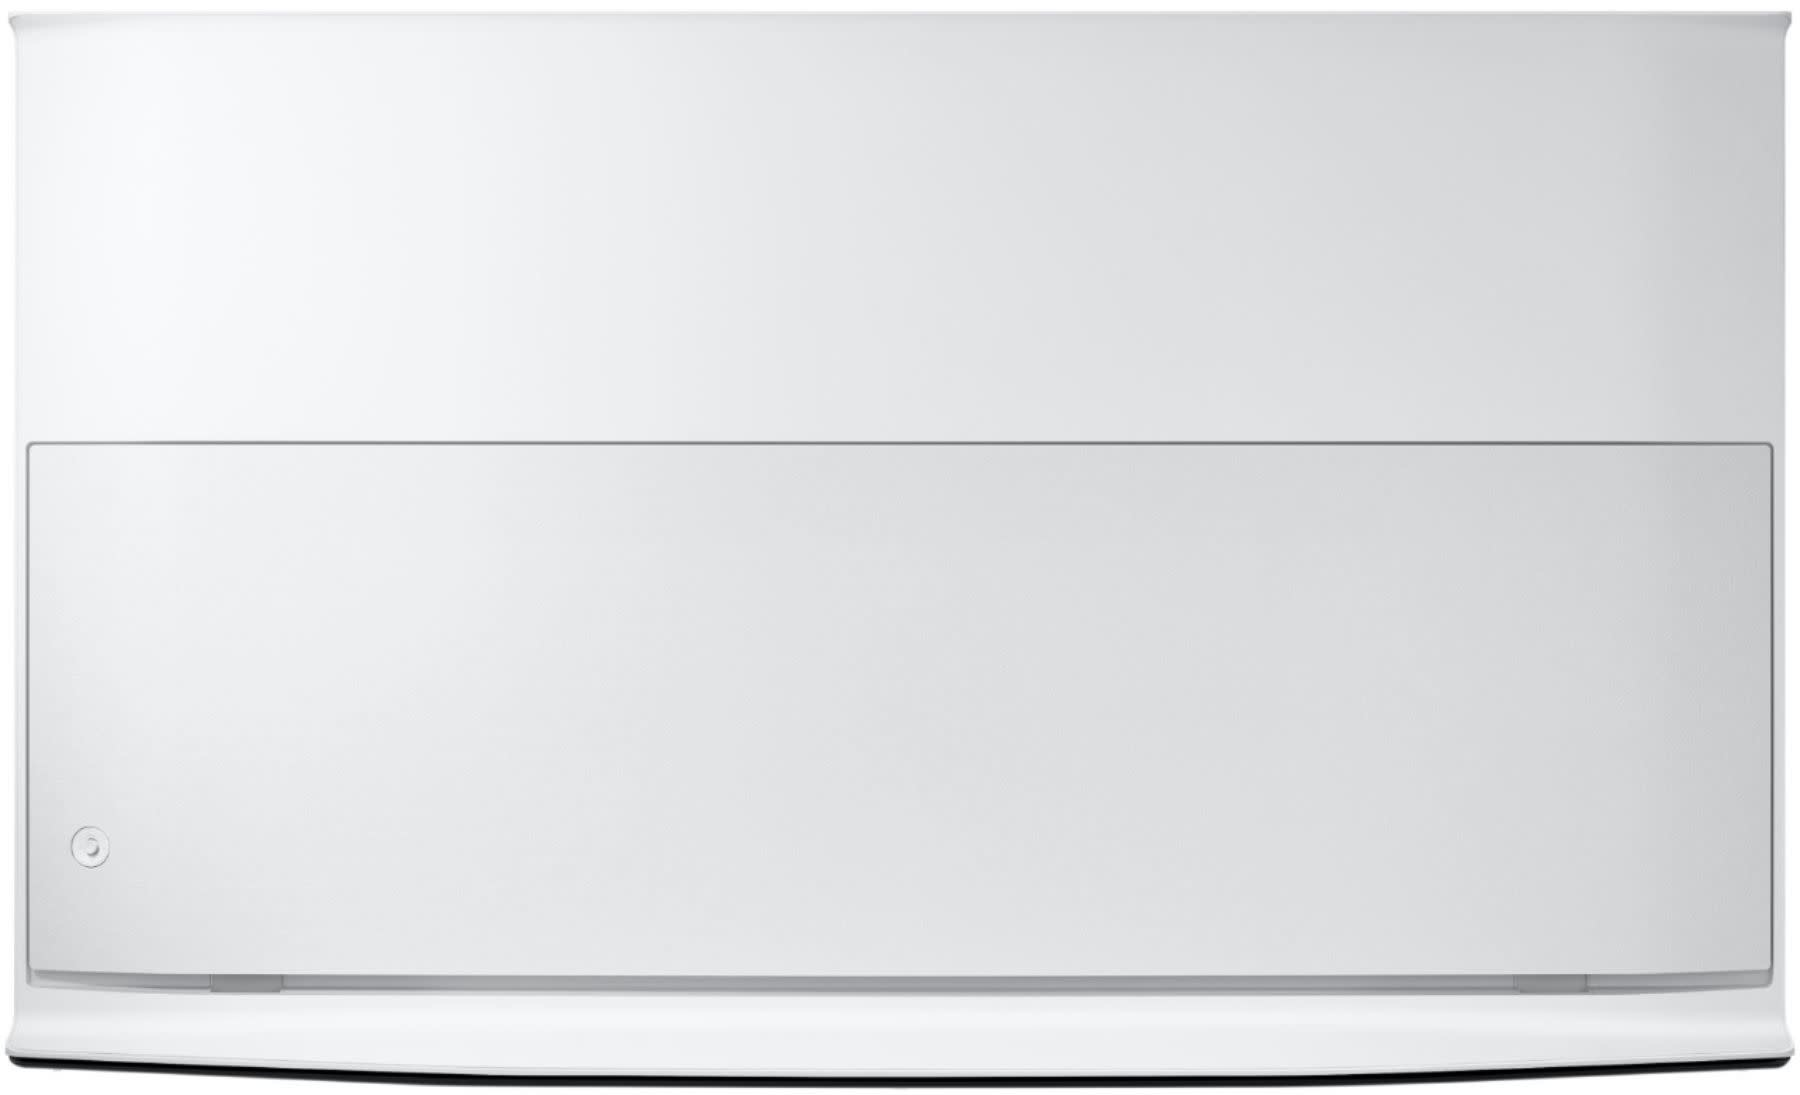 Samsung LS01 The Serif QLED 4K UHD Smart TV